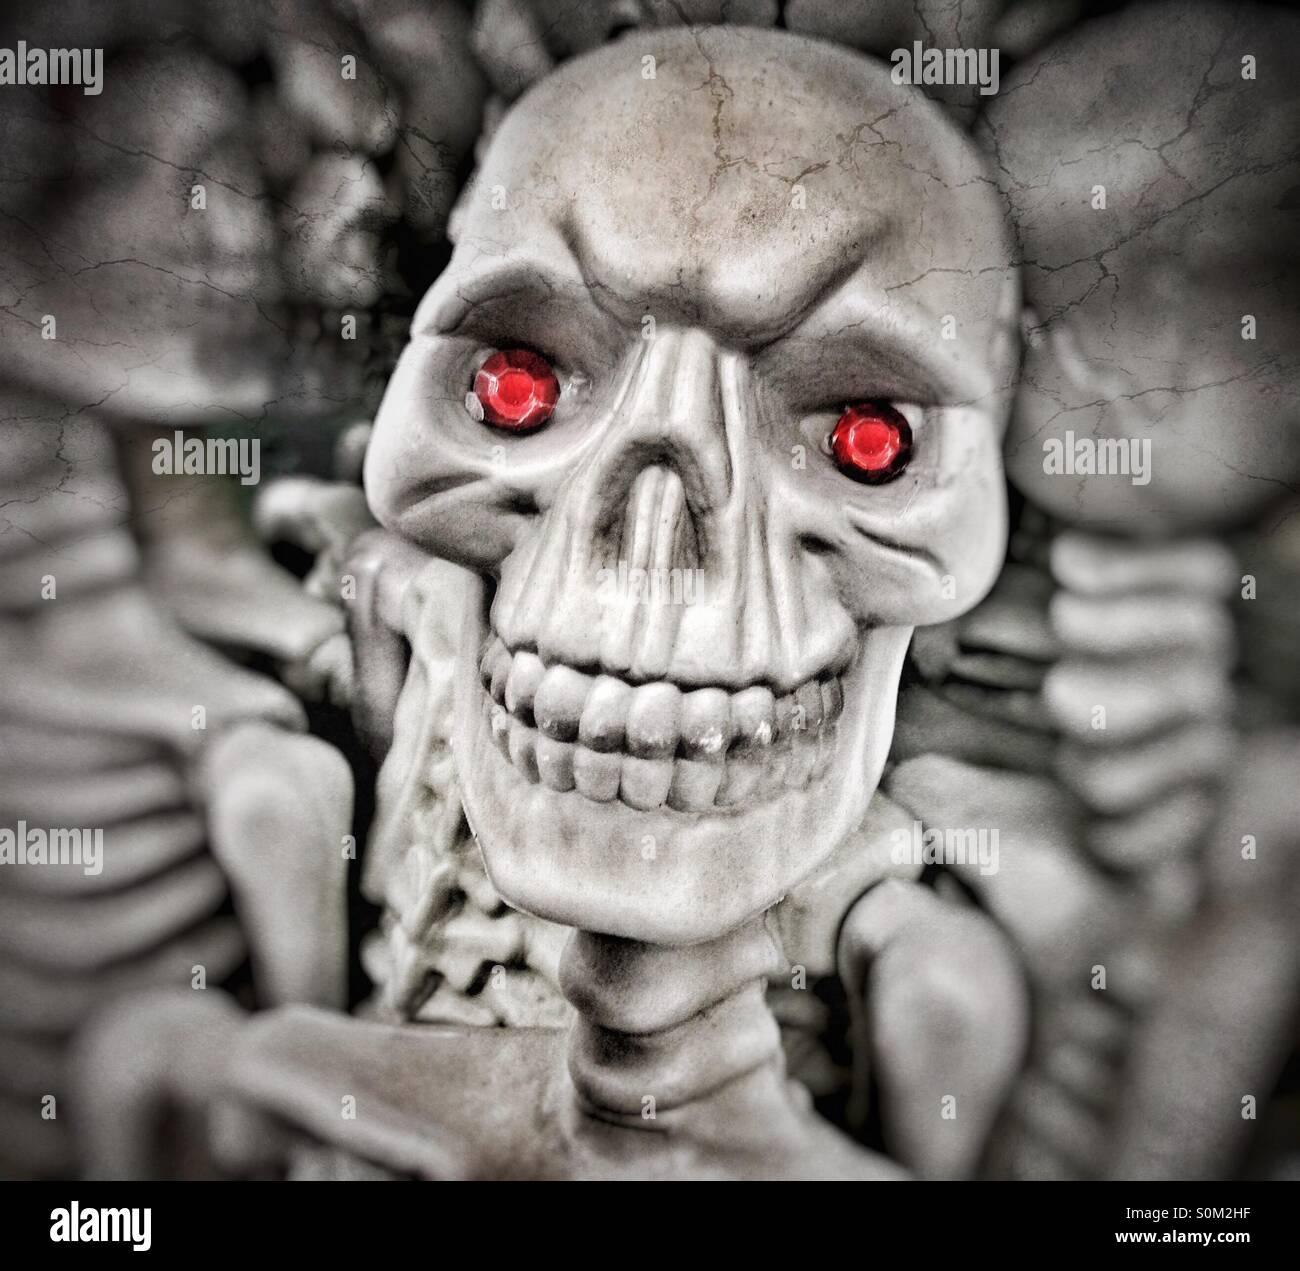 Gruselig Skelett Mit Roten Augen Stockfoto Bild 310227723 Alamy